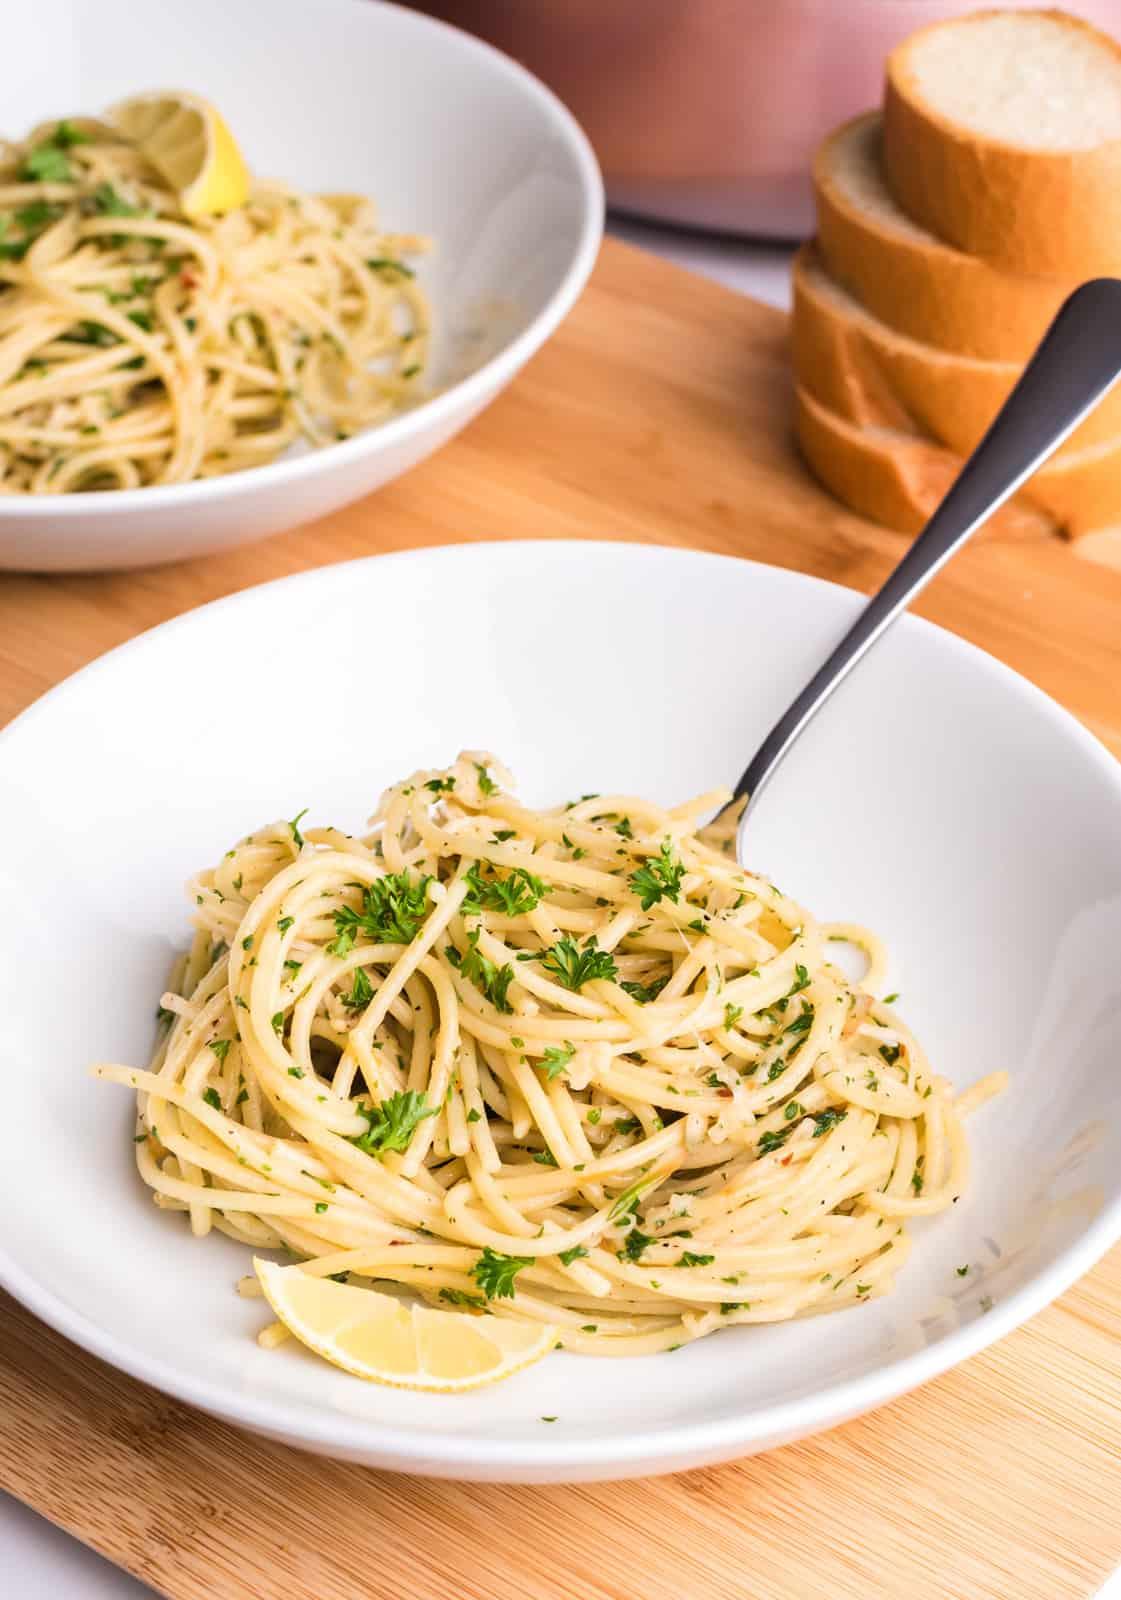 Plated Spaghetti Aglio e Olio in white dish with fork and parsley garnish.